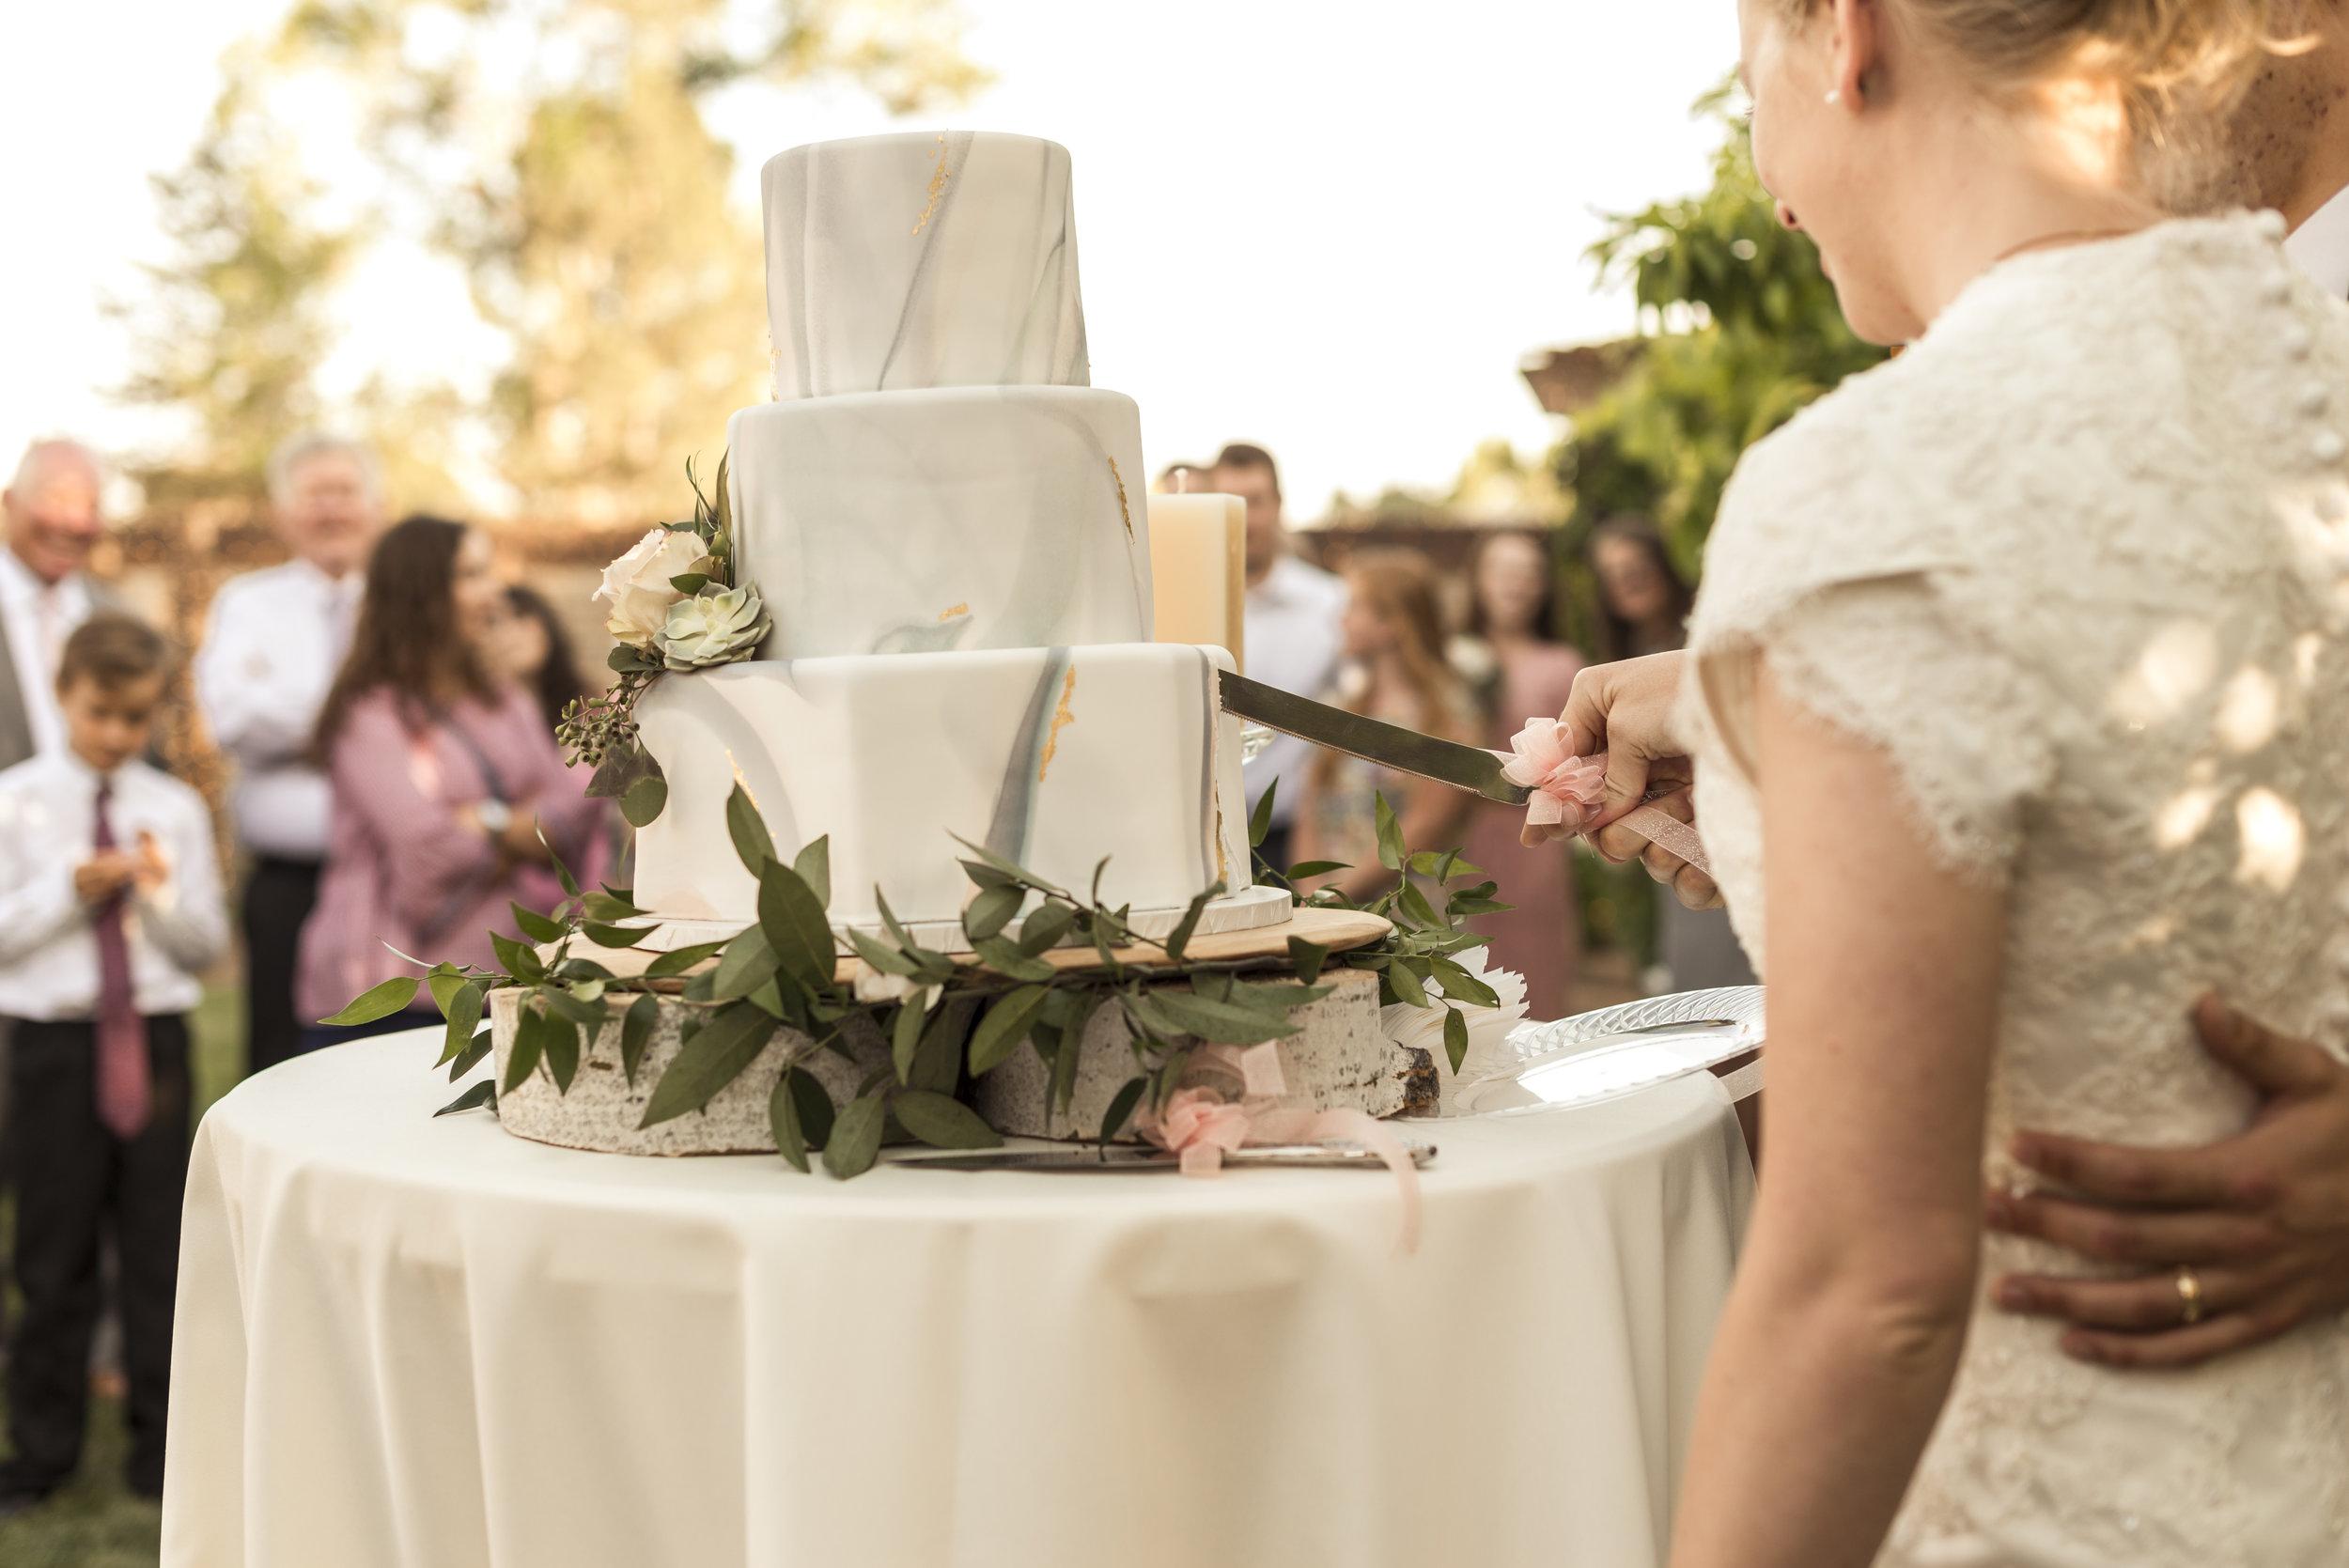 LDS Summer Wedding | South Jordan, Utah Wedding Photographer| Bri Bergman Photography 20.JPG